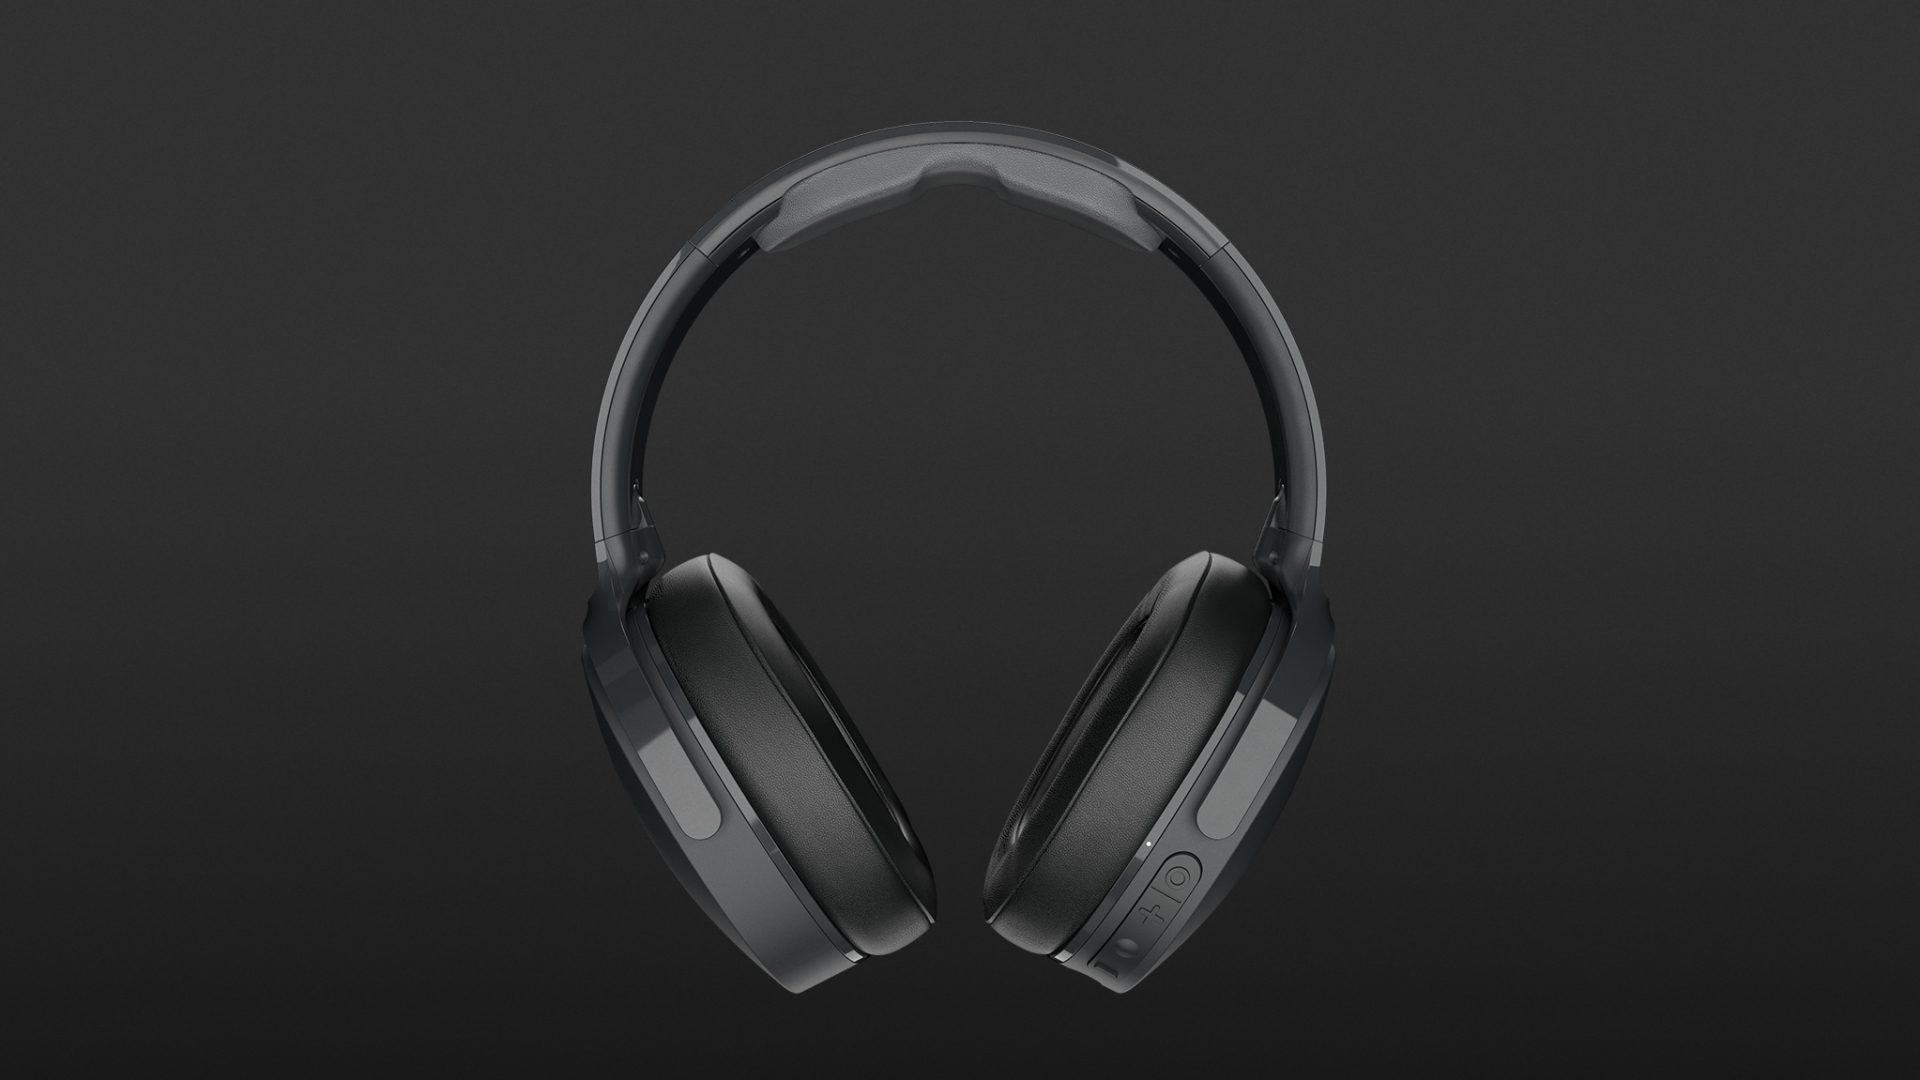 https://www.headphonecheck.com/test/skullcandy-hesh-anc/